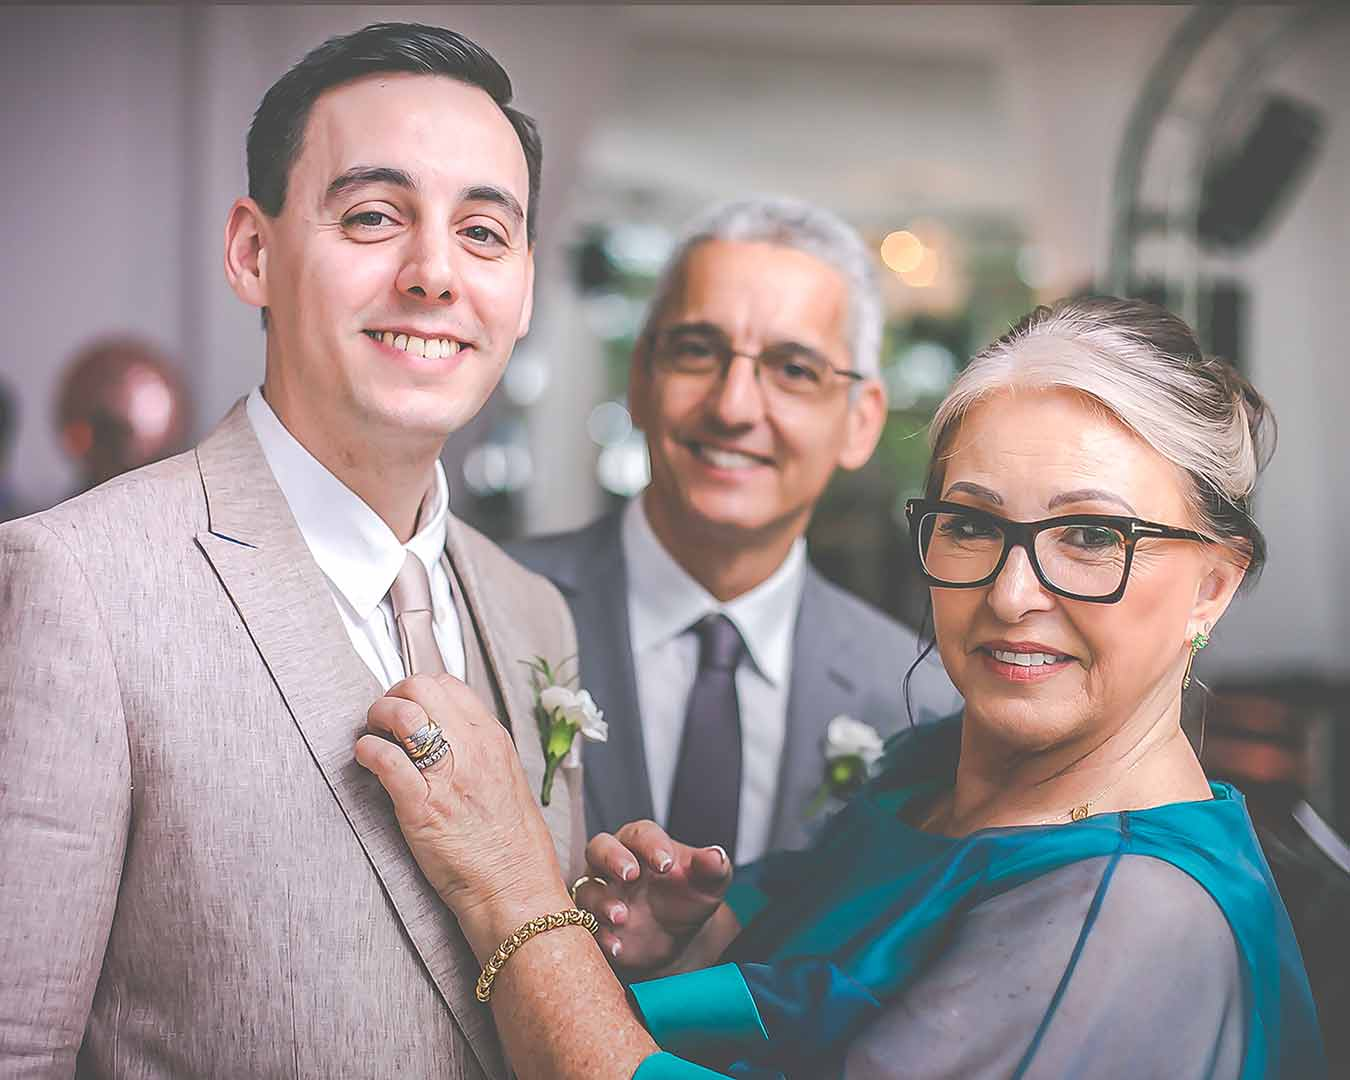 mãe noivo ajeitando a gravata do noivo